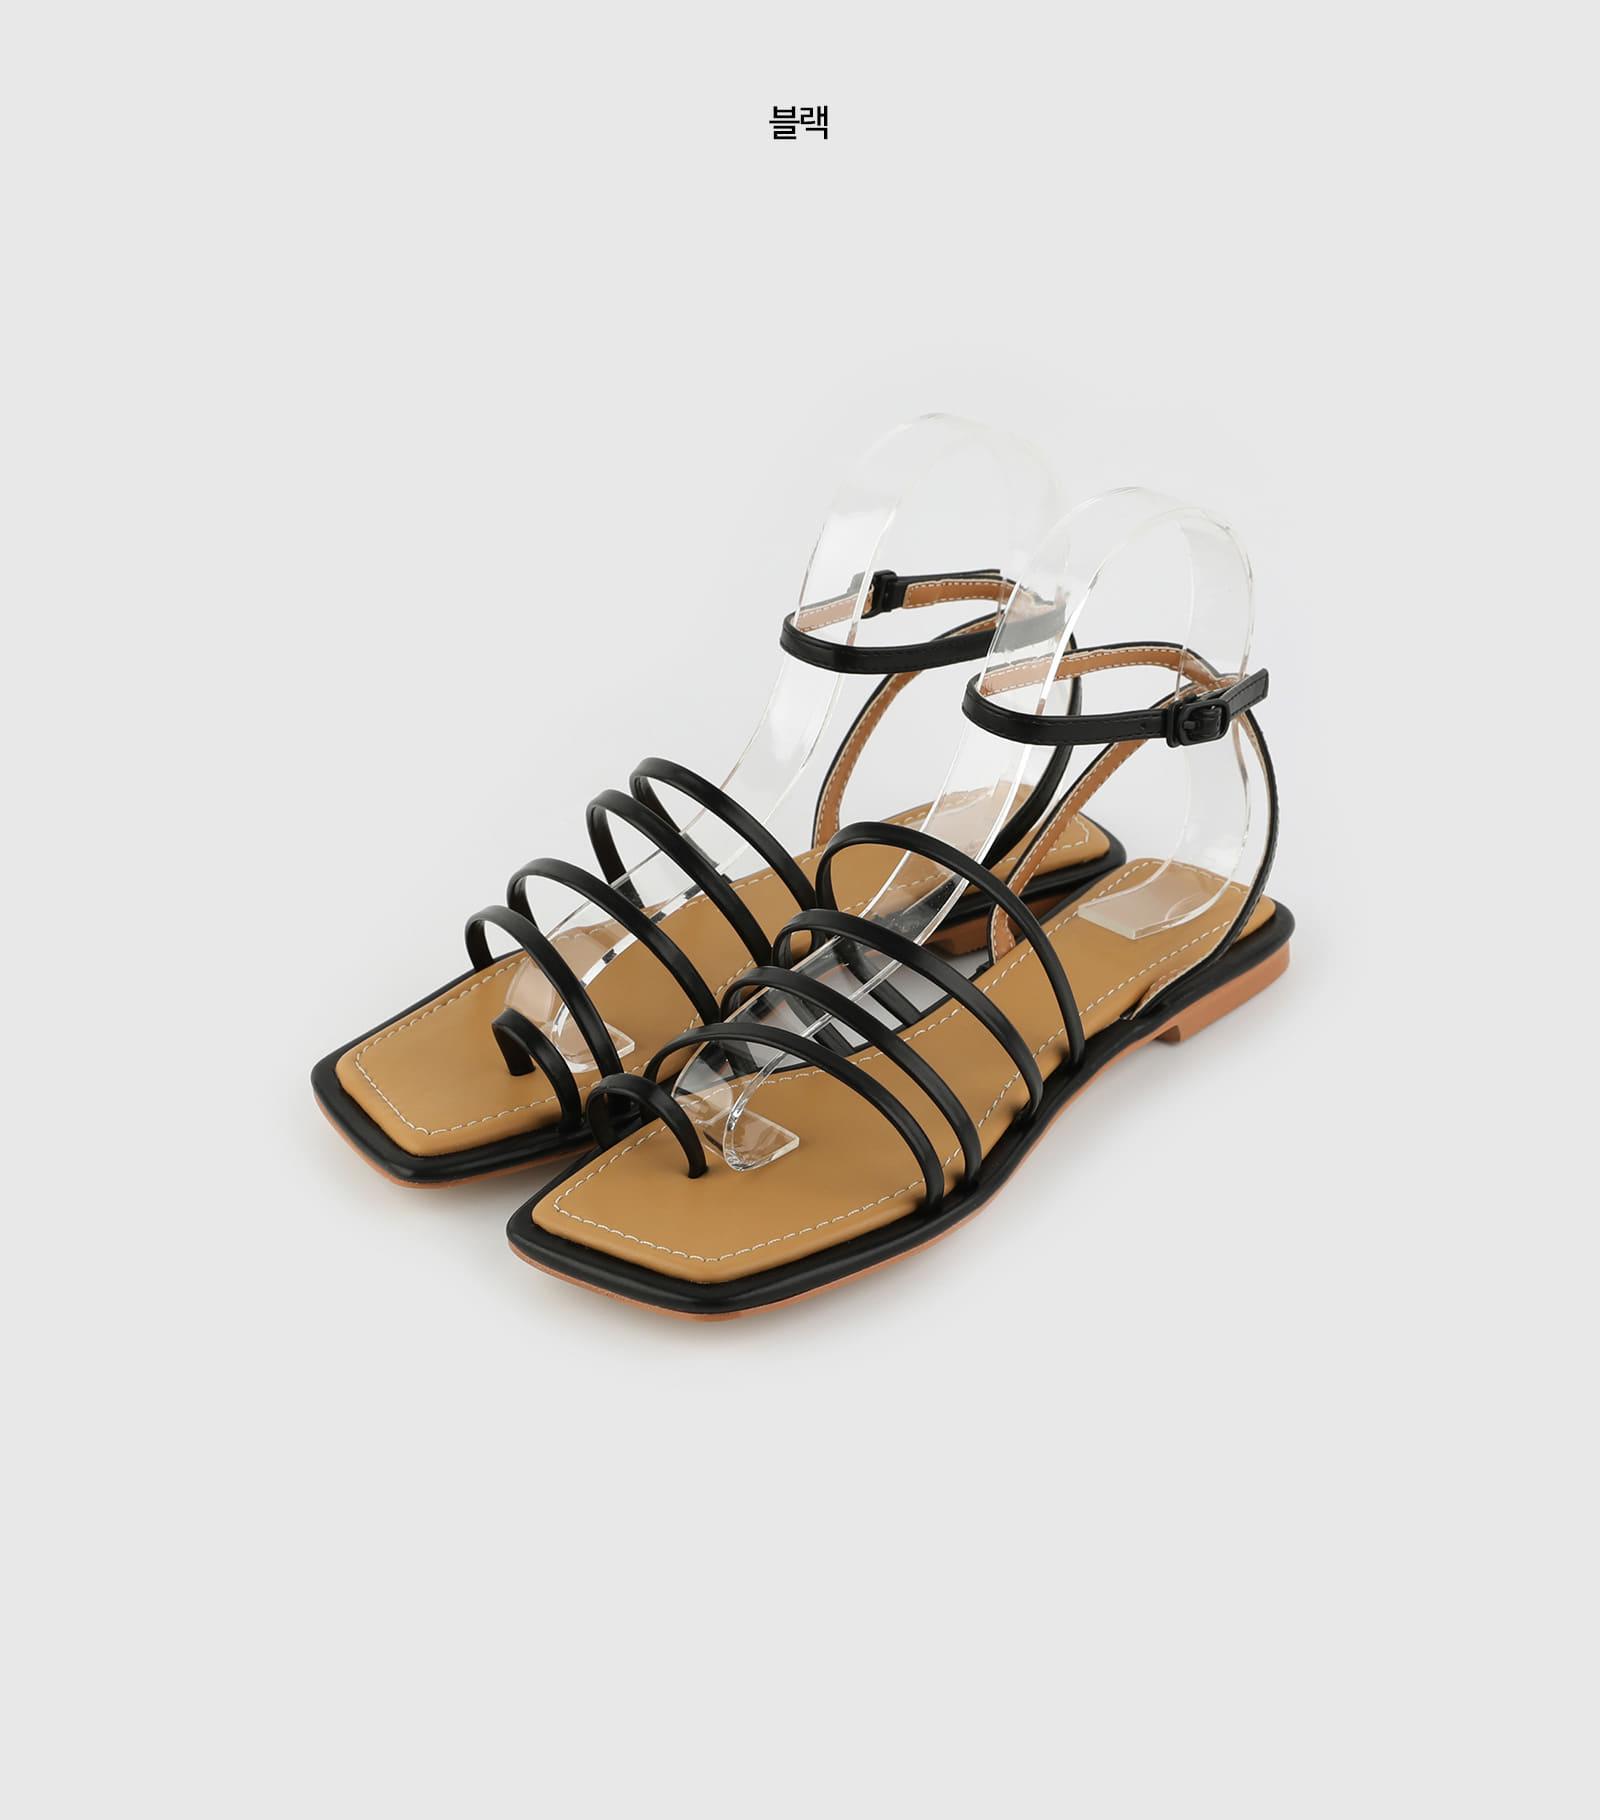 Screw toe hold flat sandals